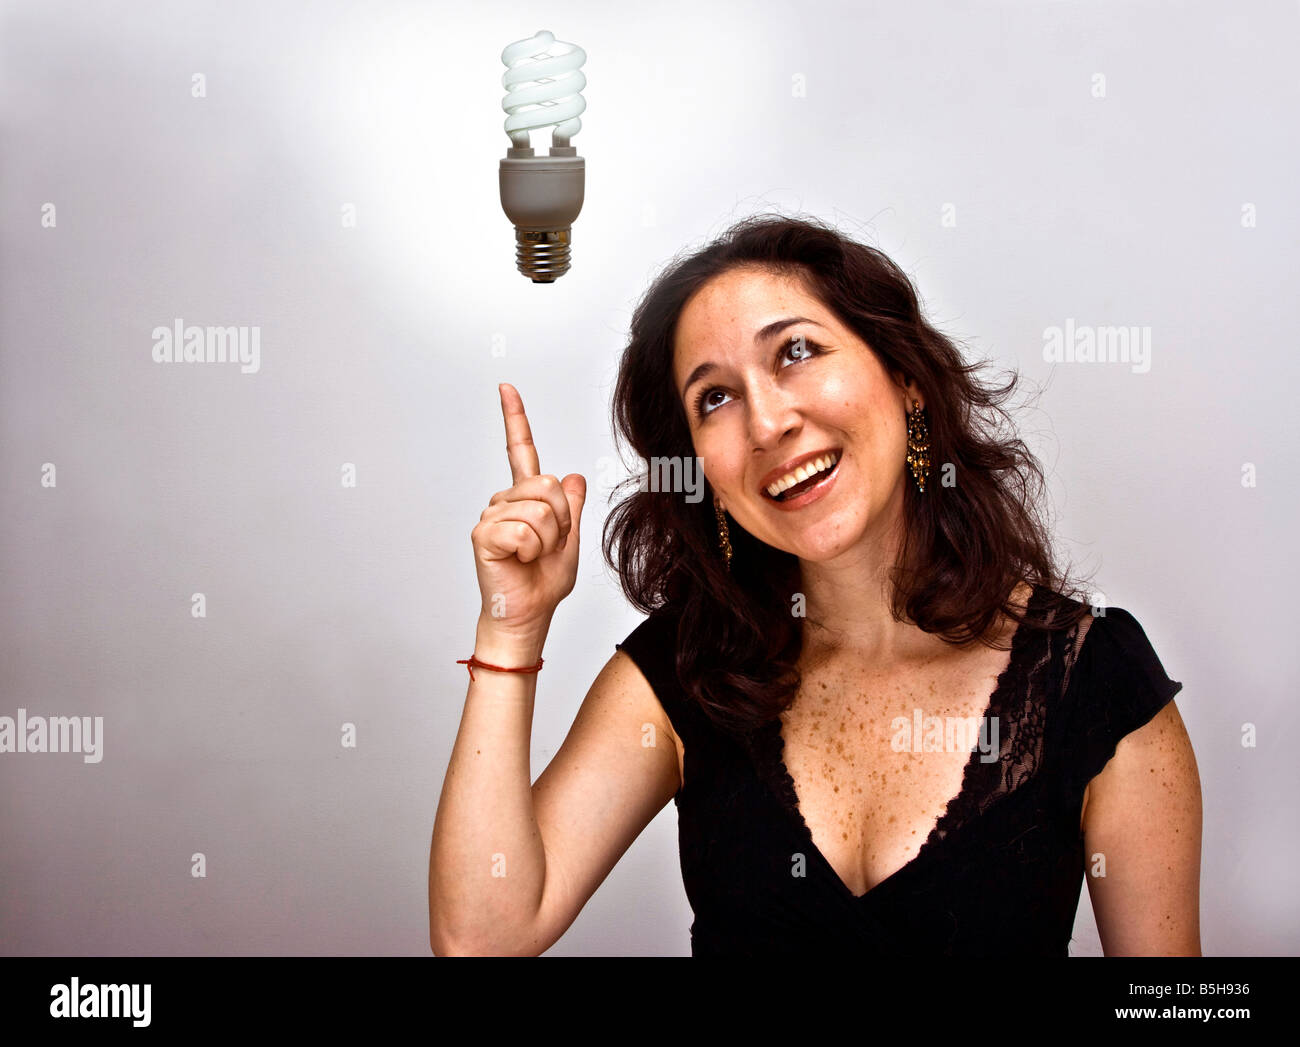 Woman having an environmentally brilliant idea - Stock Image